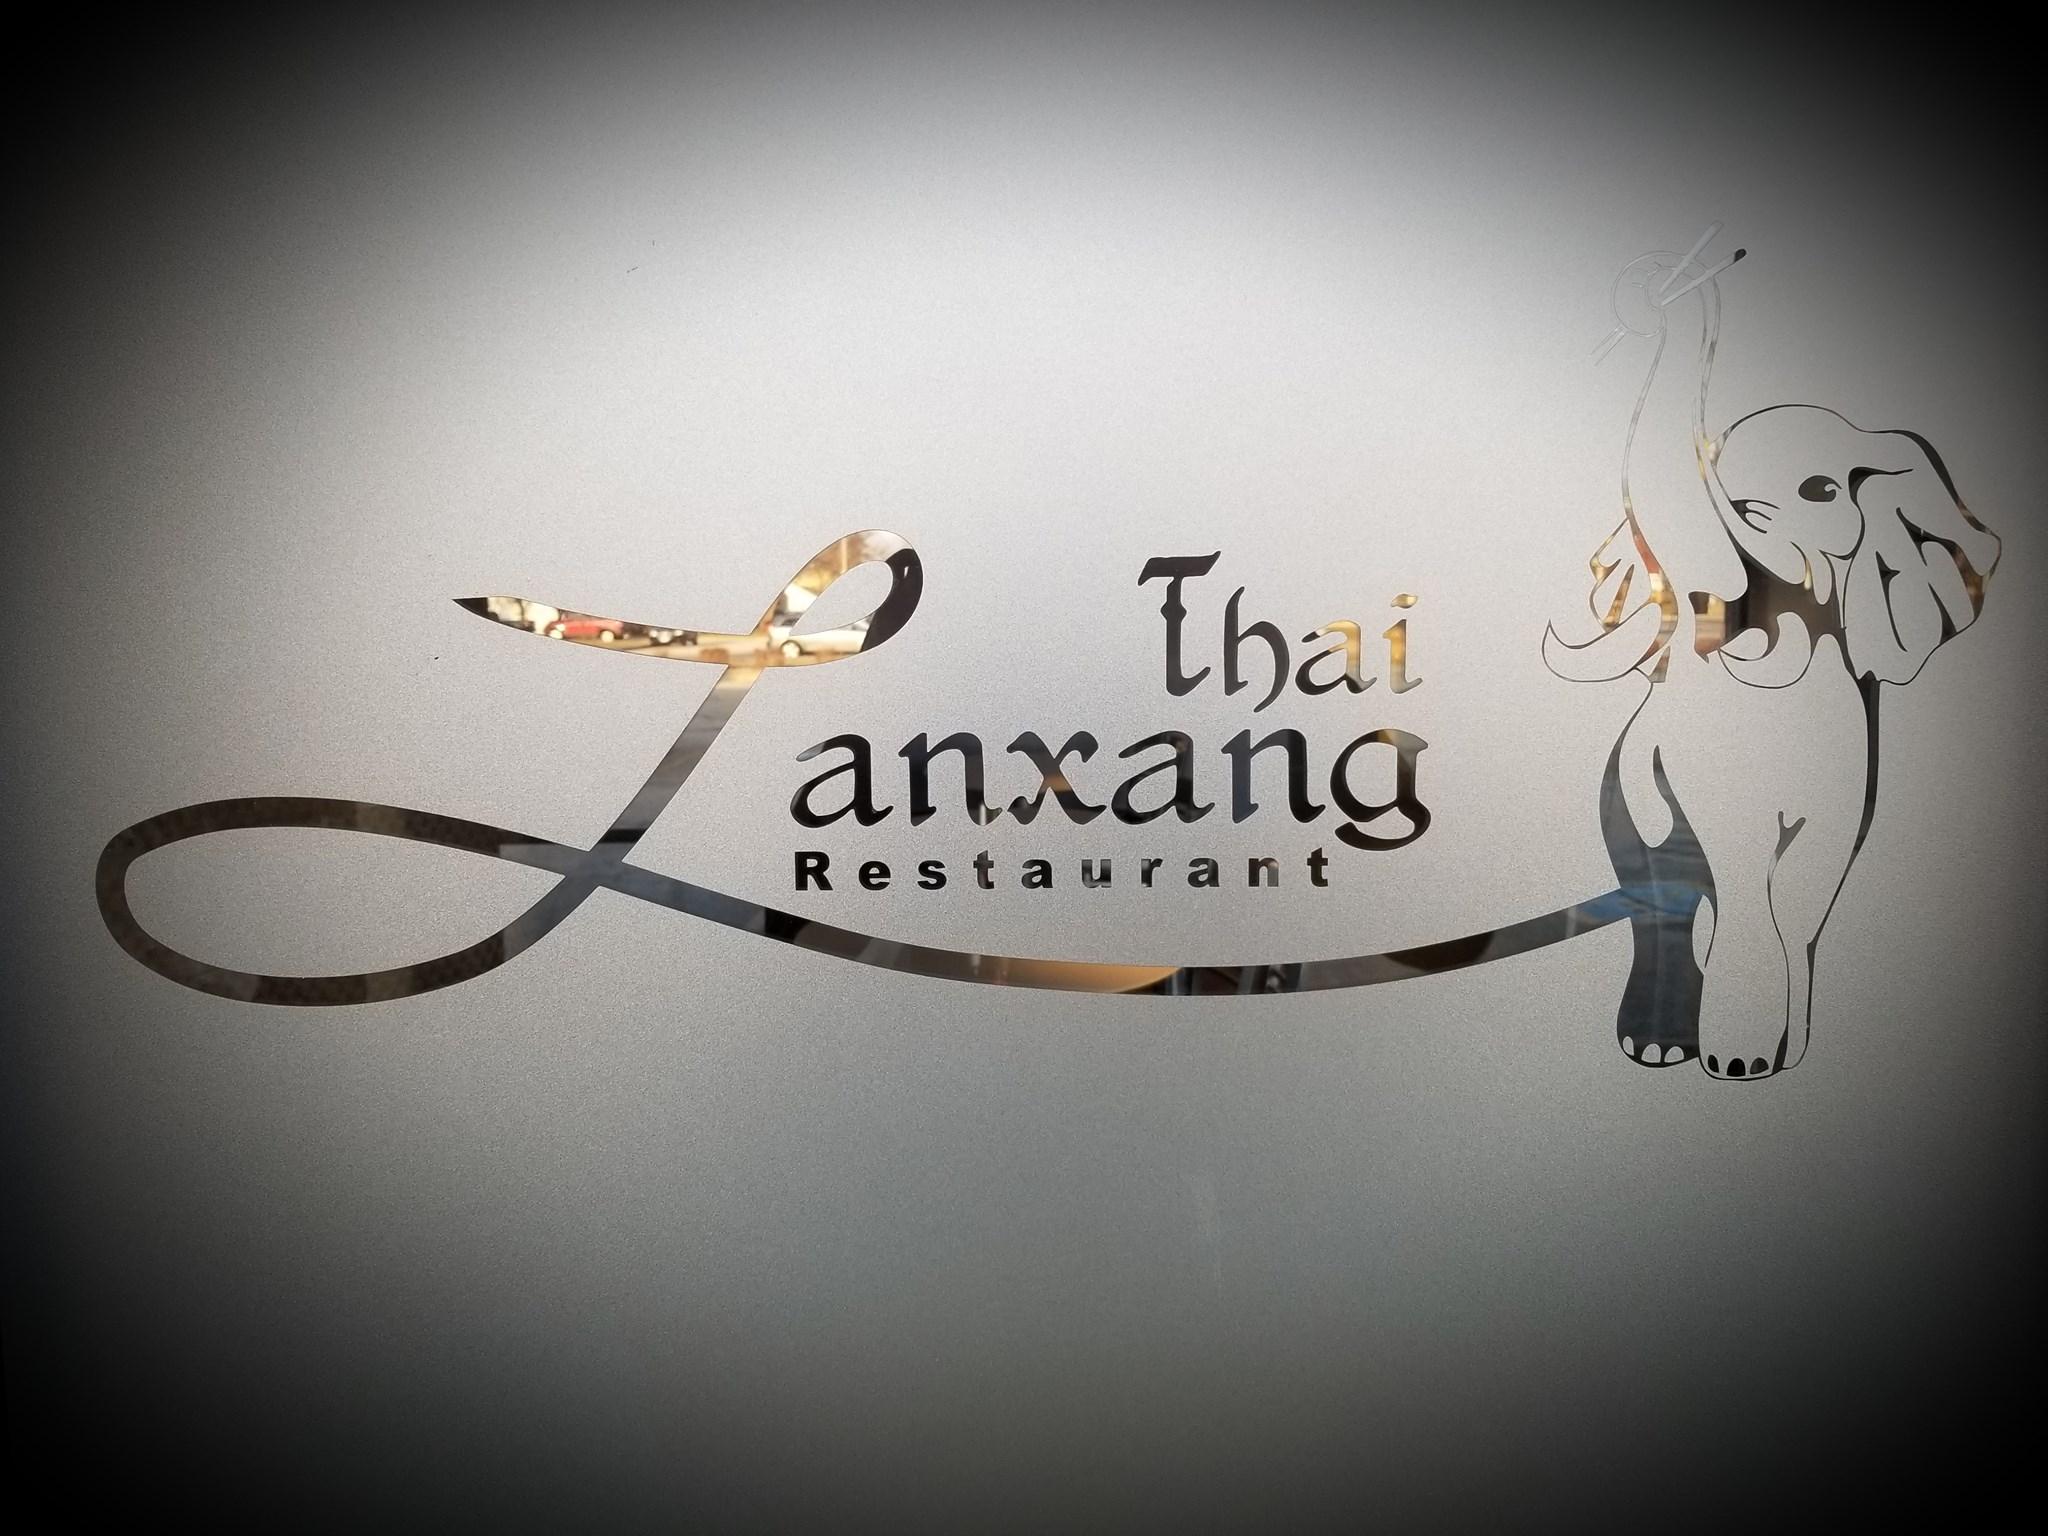 Thai Lanxang Restaurant